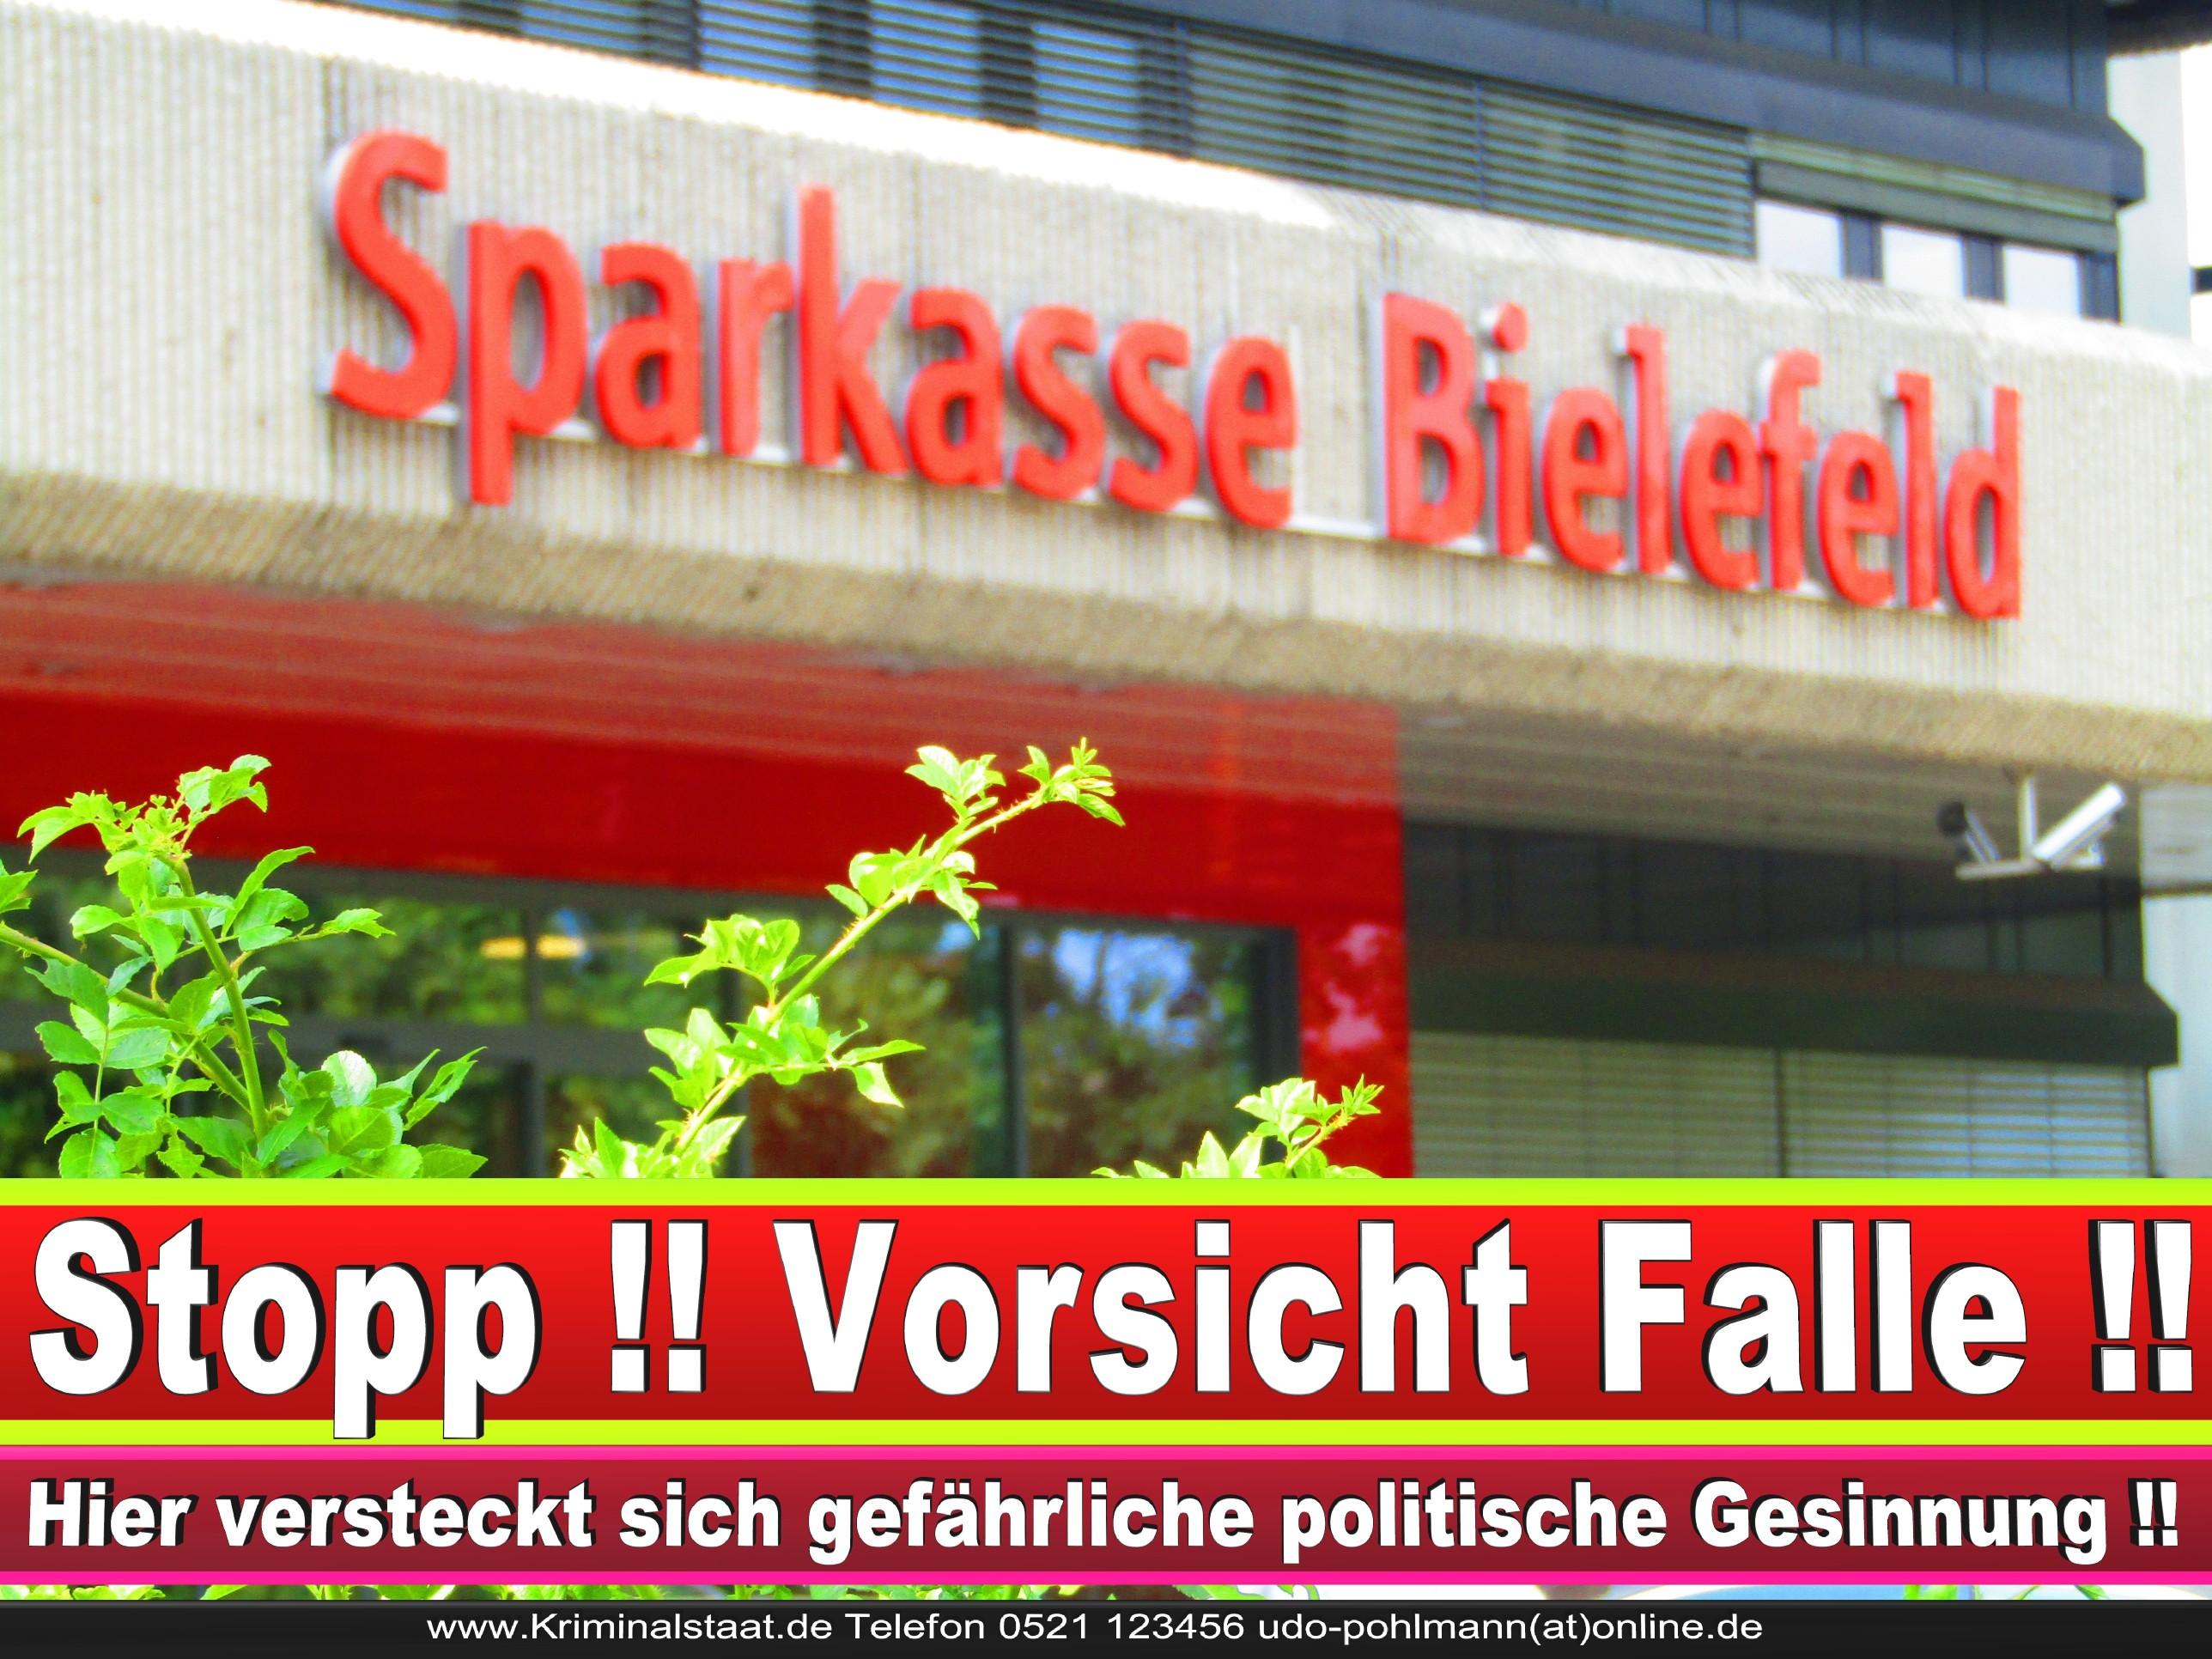 SPARKASSE BIELEFELD ANDREAS RÜTHER CDU BIELEFELD 4 LANDTAGSWAHL BUNDESTAGSWAHL BÜRGERMEISTERWAHL